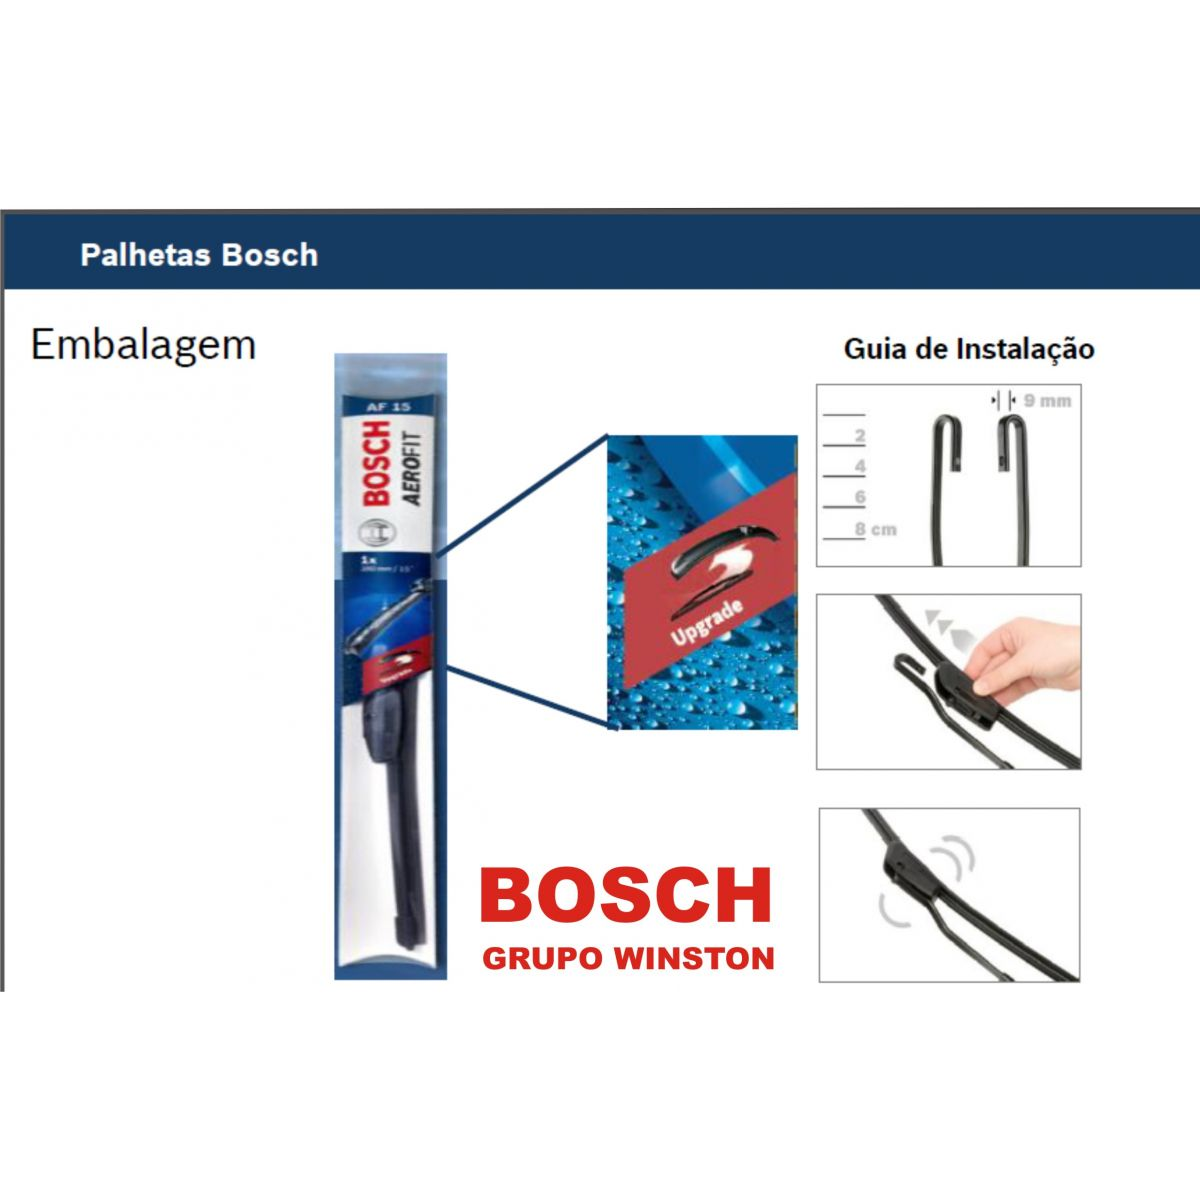 Palheta Bosch Aerofit Limpador de para brisa Bosch MERCEDES BENZ Classe A 160 / 190